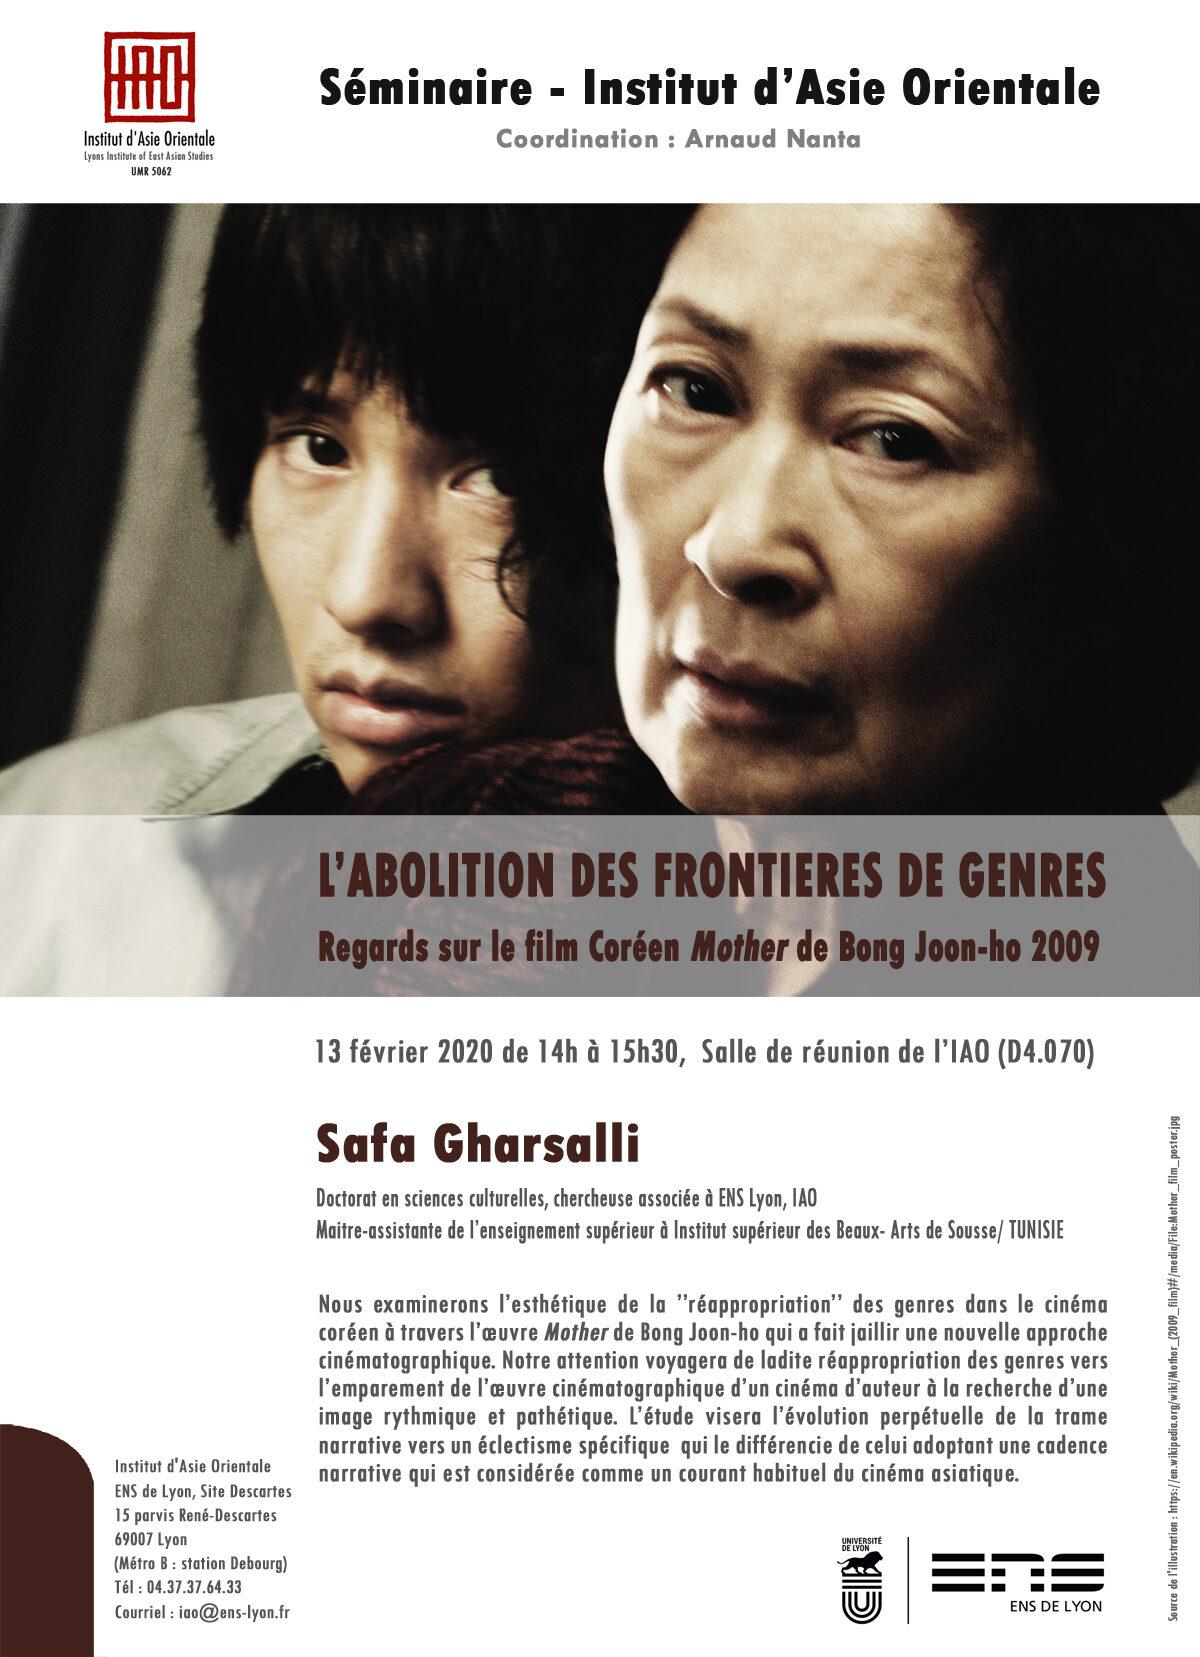 Séminaire de l'IAO : Safa Gharsalli